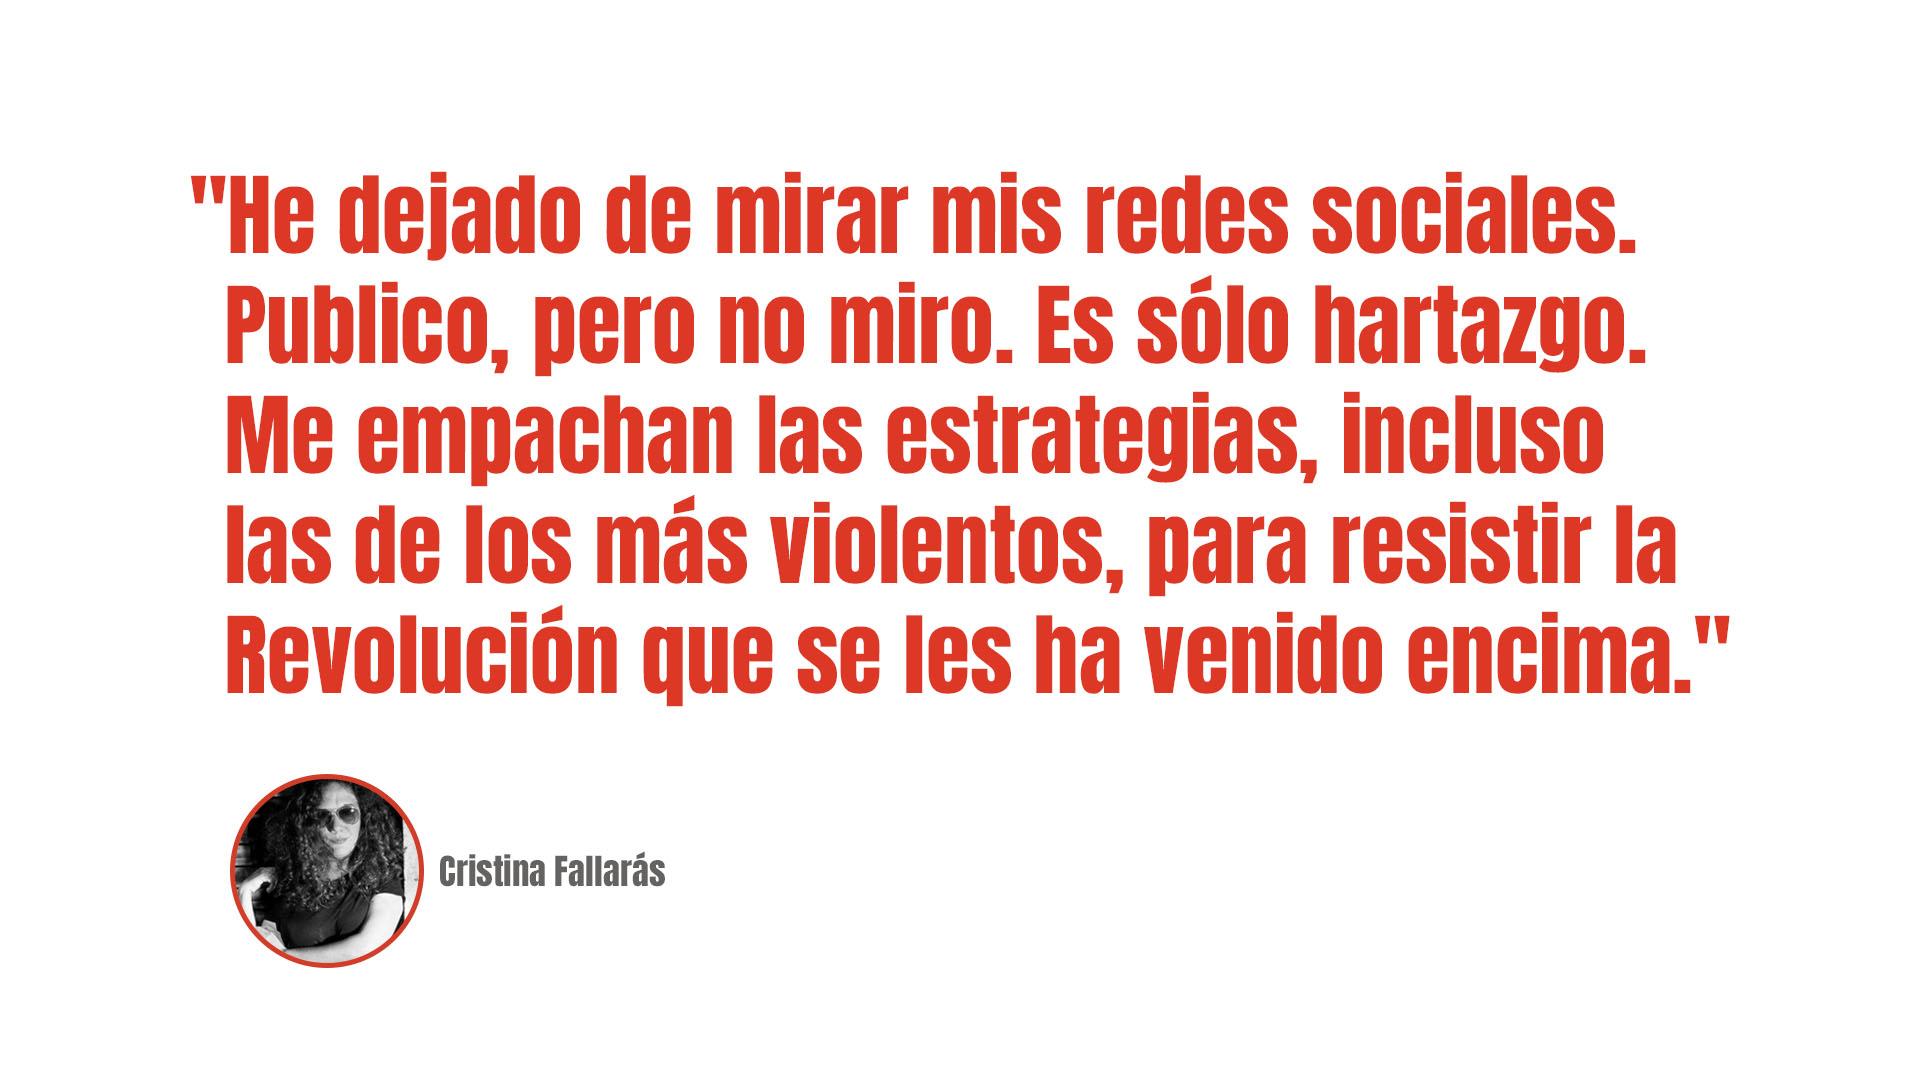 Cristina Fallarás: Su paupérrima estrategia de resistencia